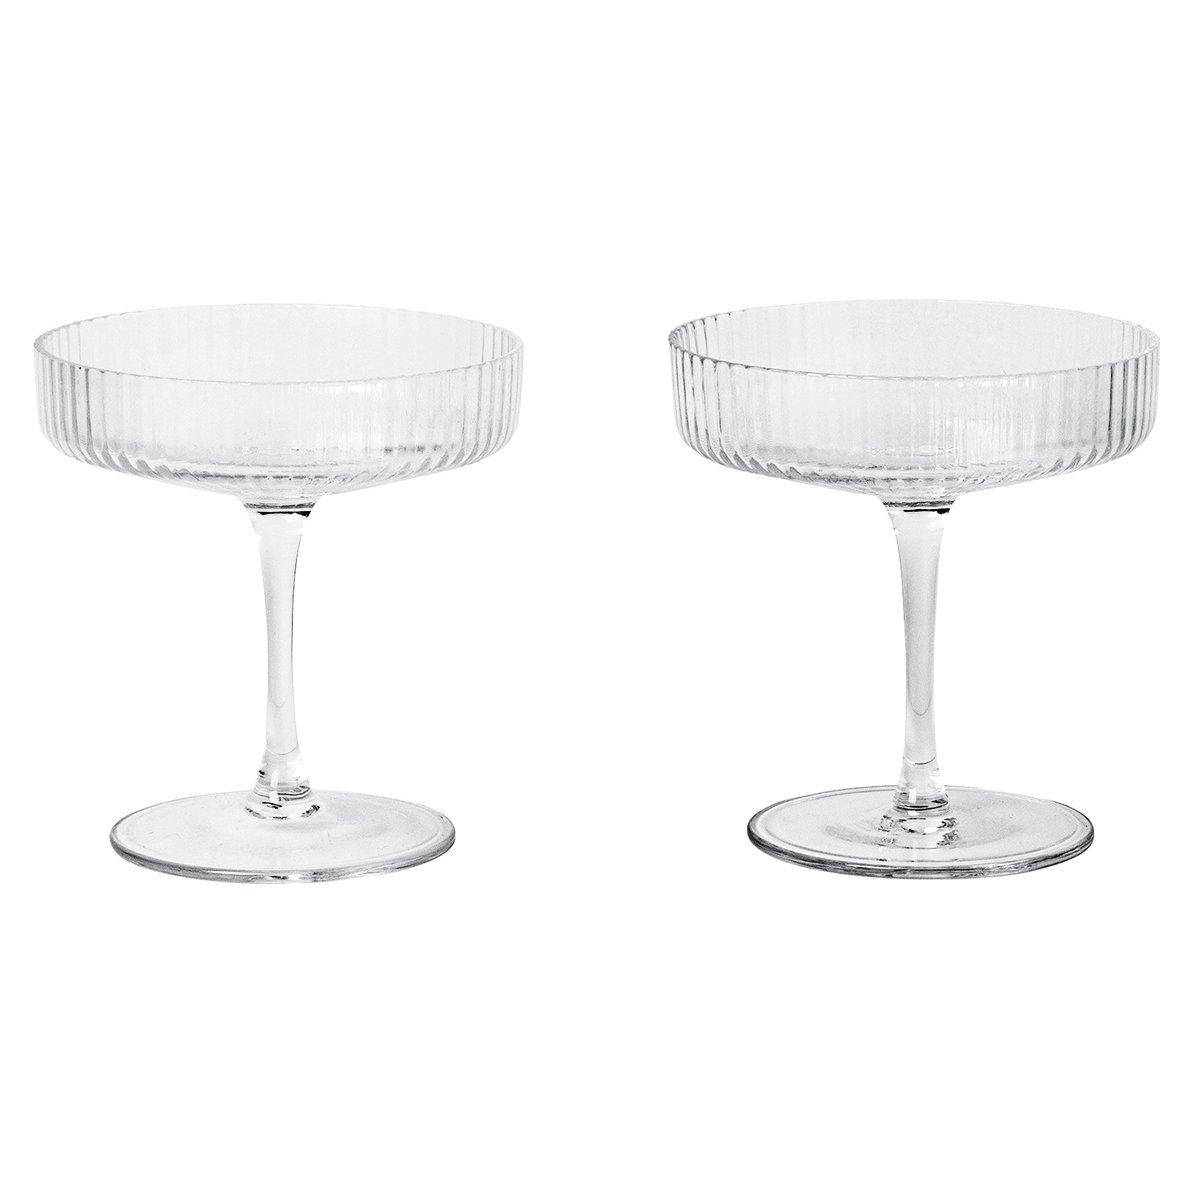 Ferm Living Ripple Champagneglas, set van 2